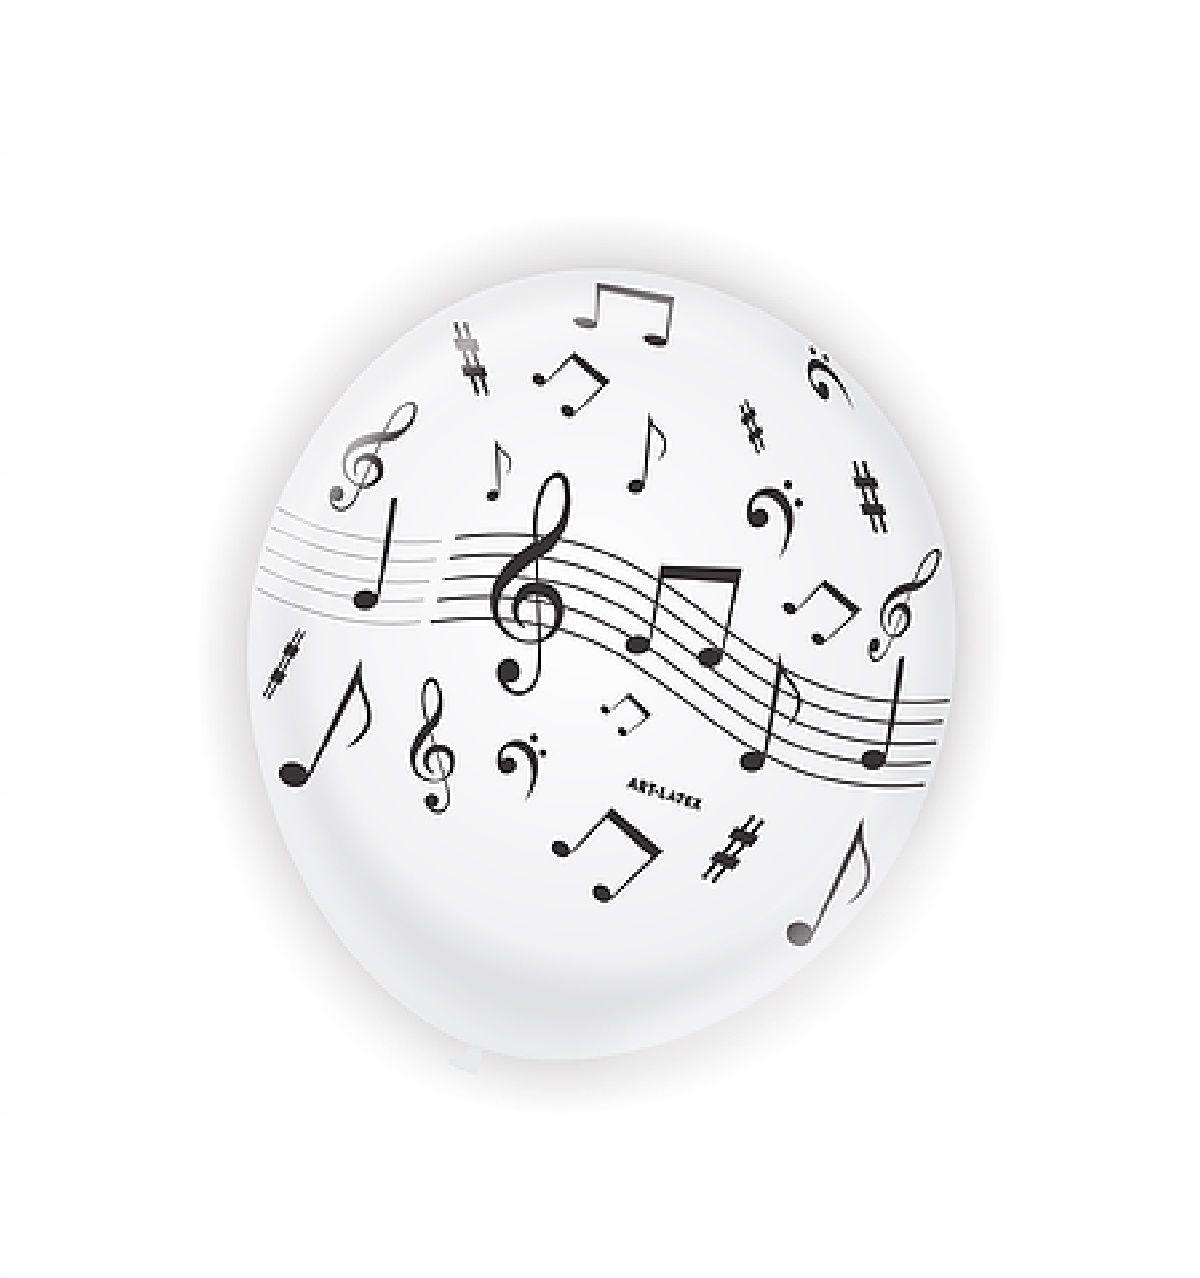 25 bexiga temática notas musicais n11